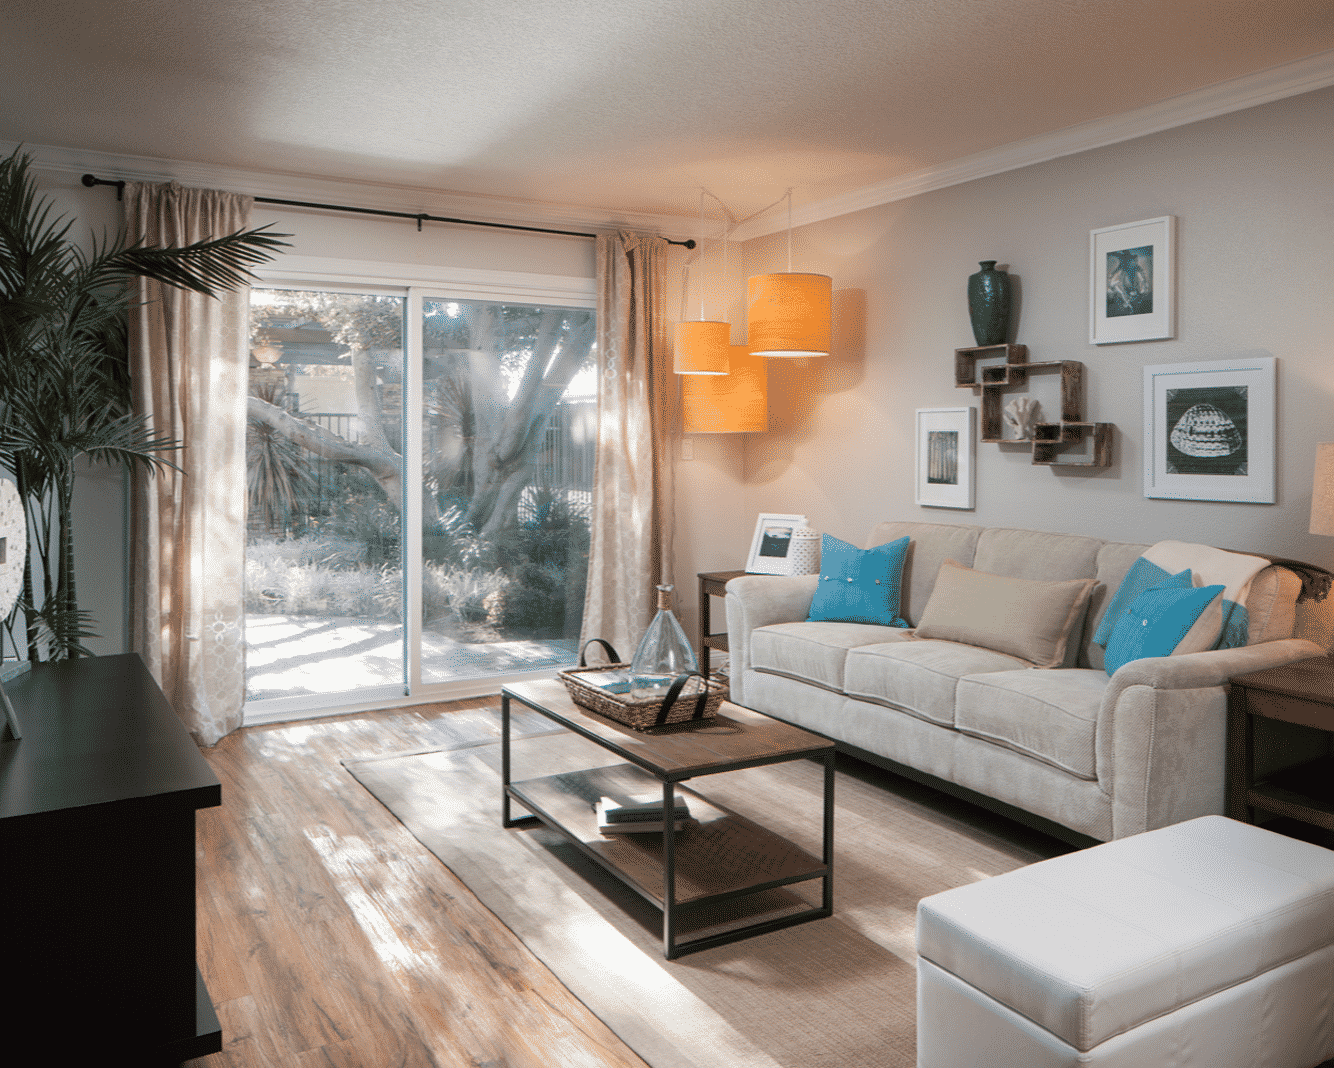 Dual pane windows & airy natural light